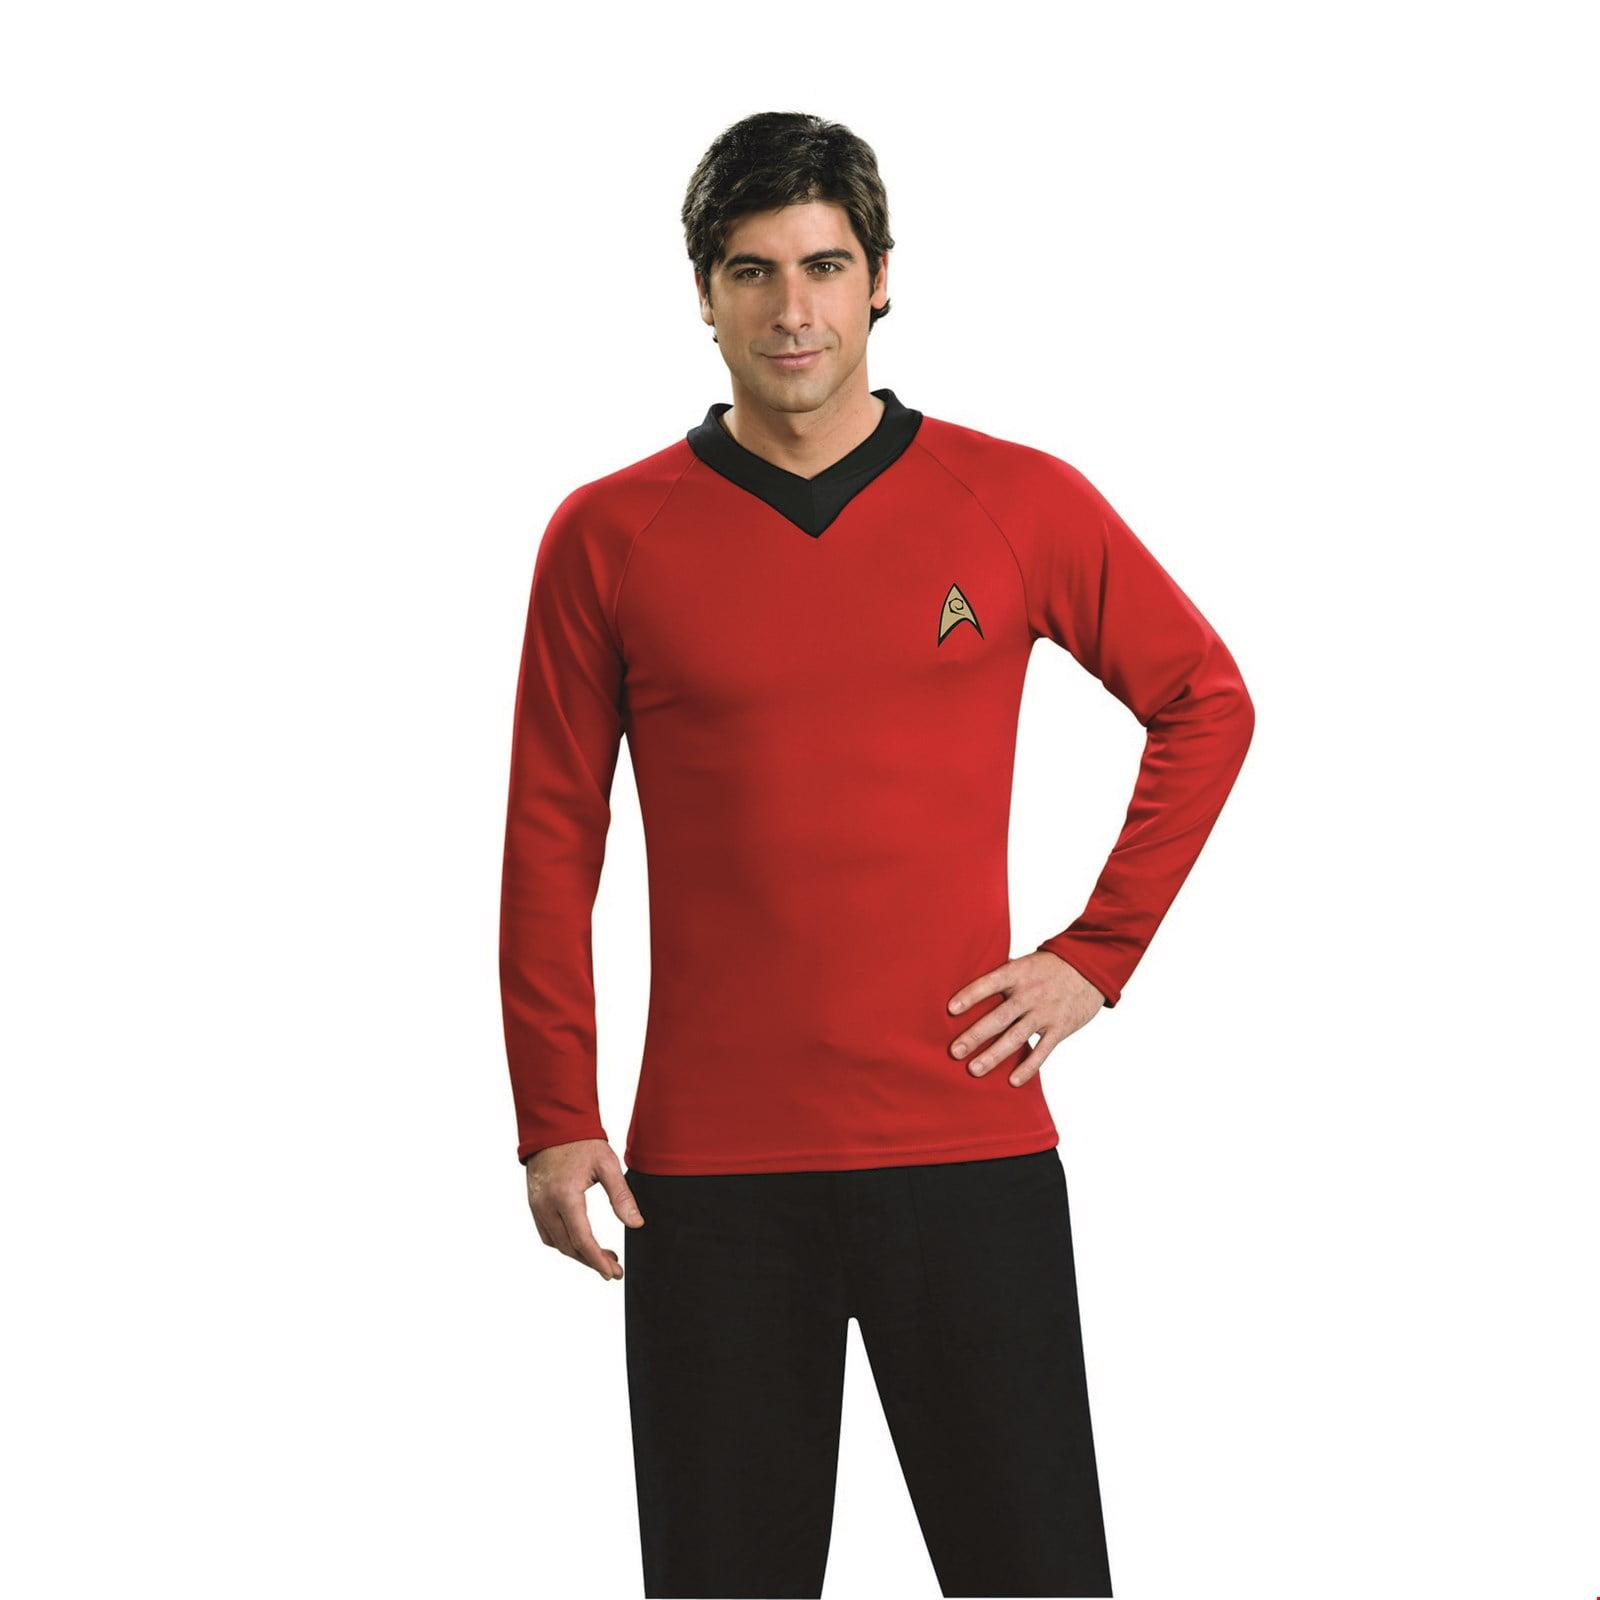 Star Trek Mens Classic Deluxe Blue Shirt Adult M Halloween Costume